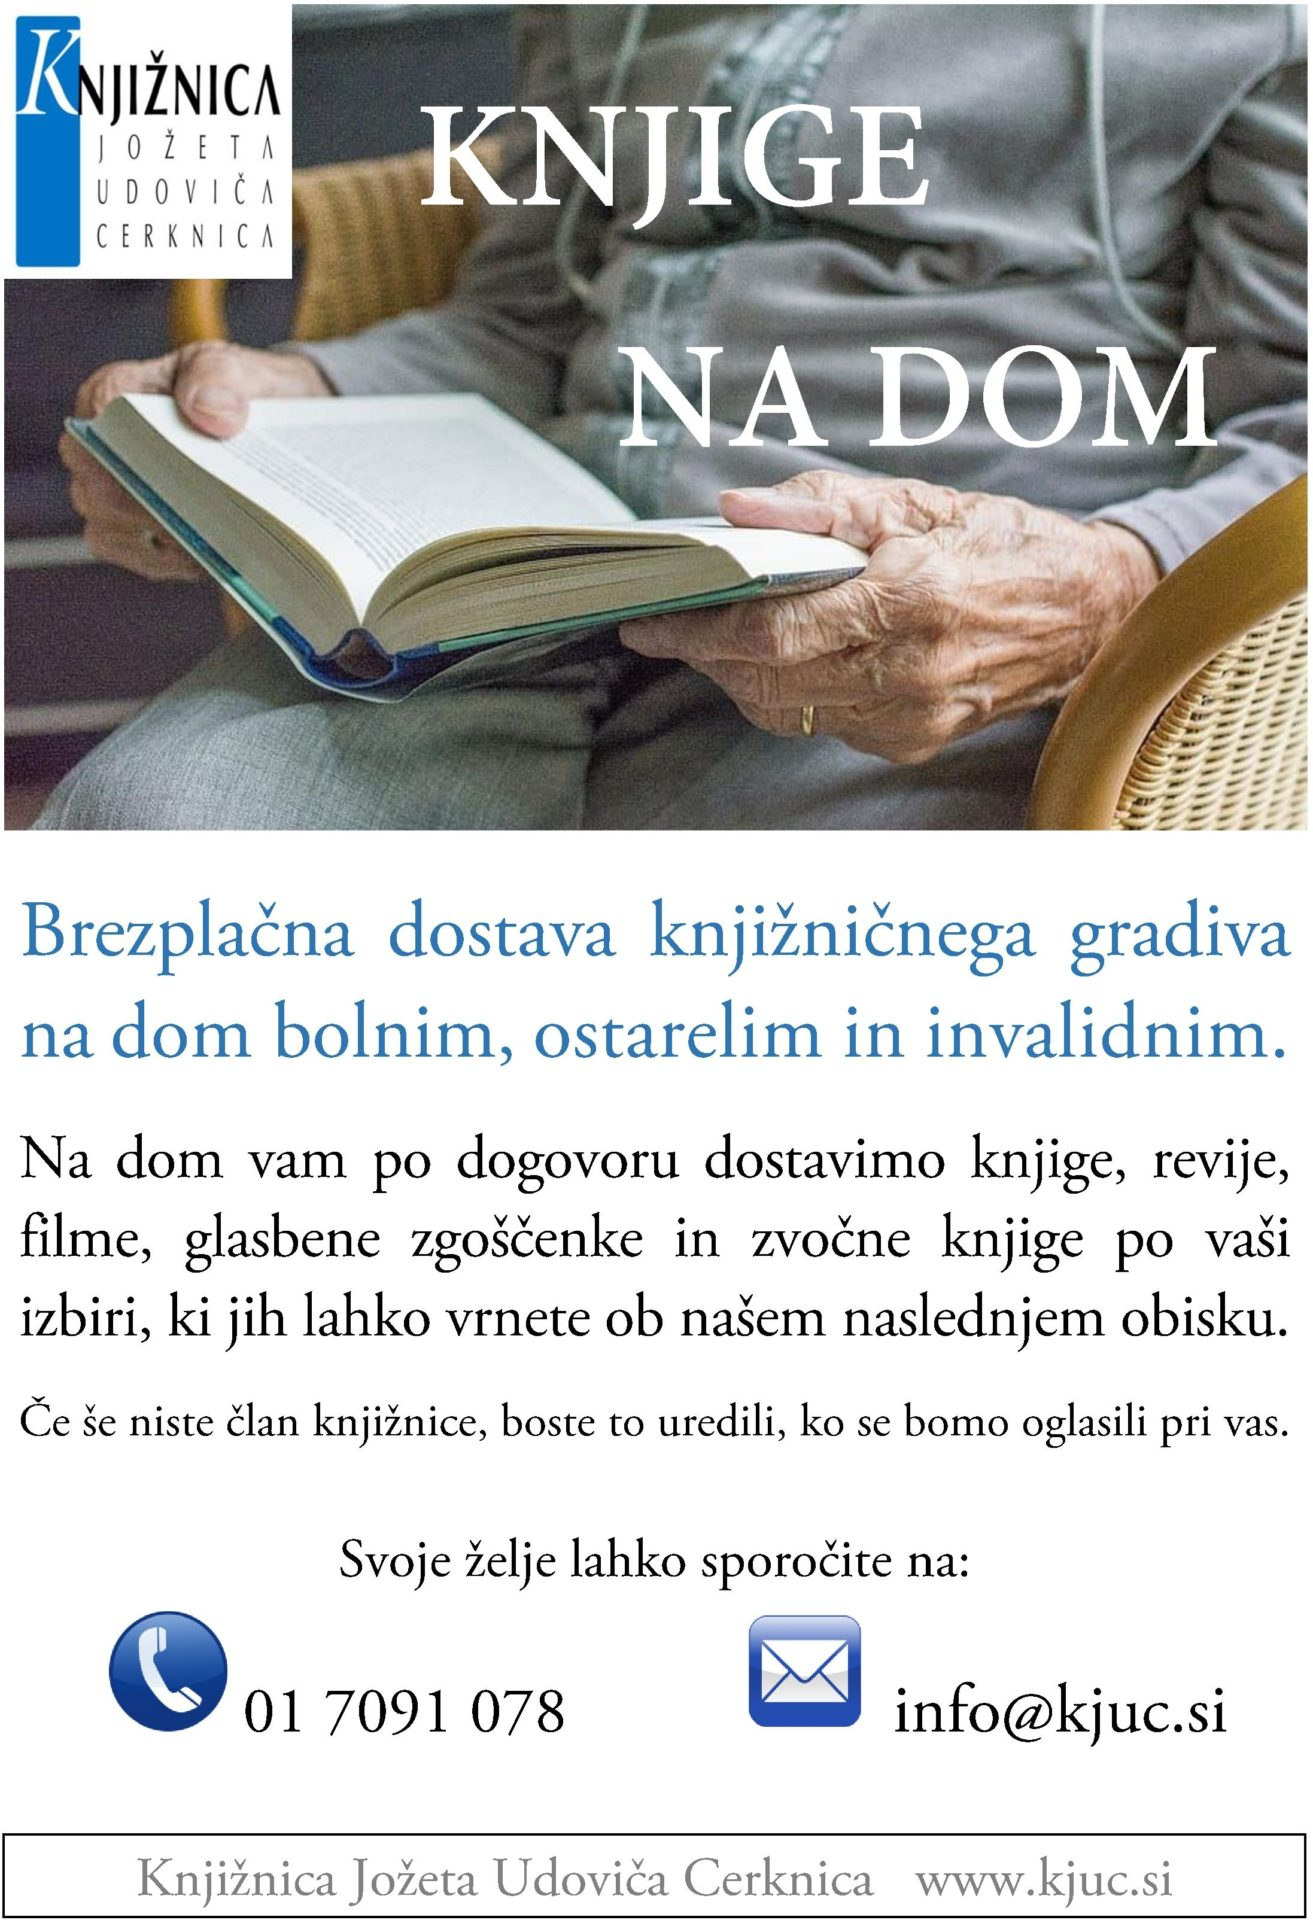 reklama koncna page 001 - Knjige na dom